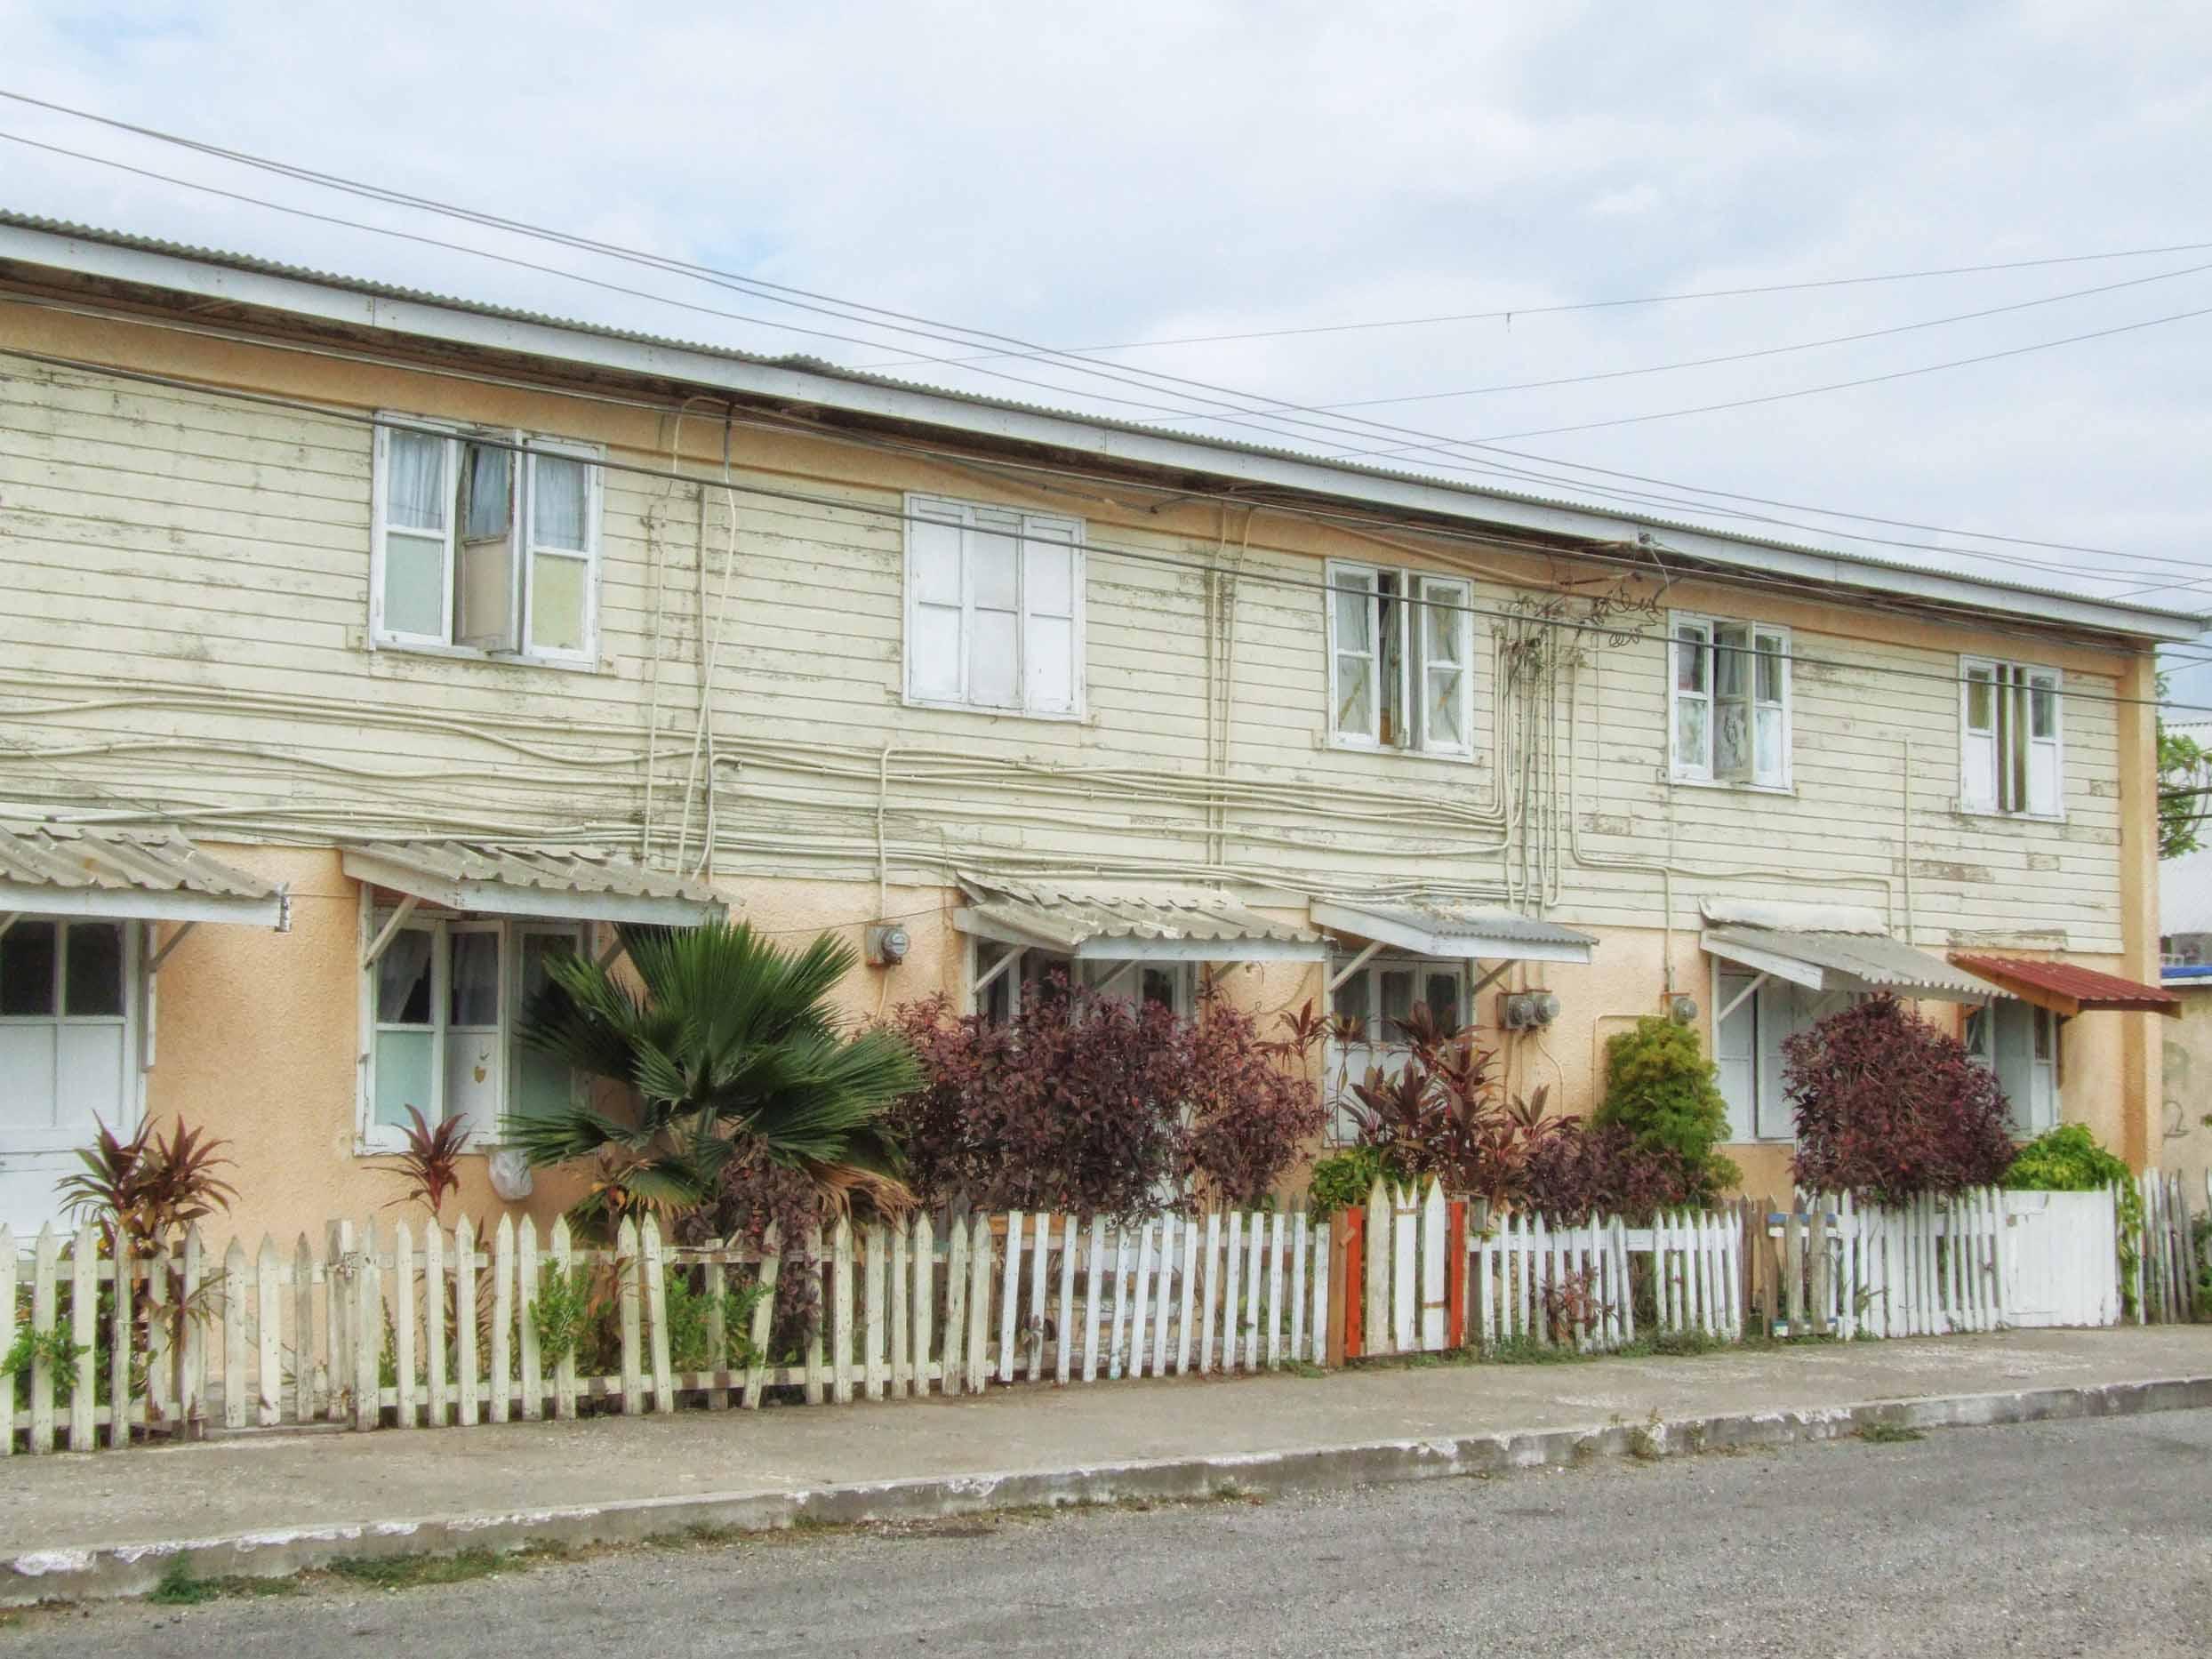 Row of wood-framed houses